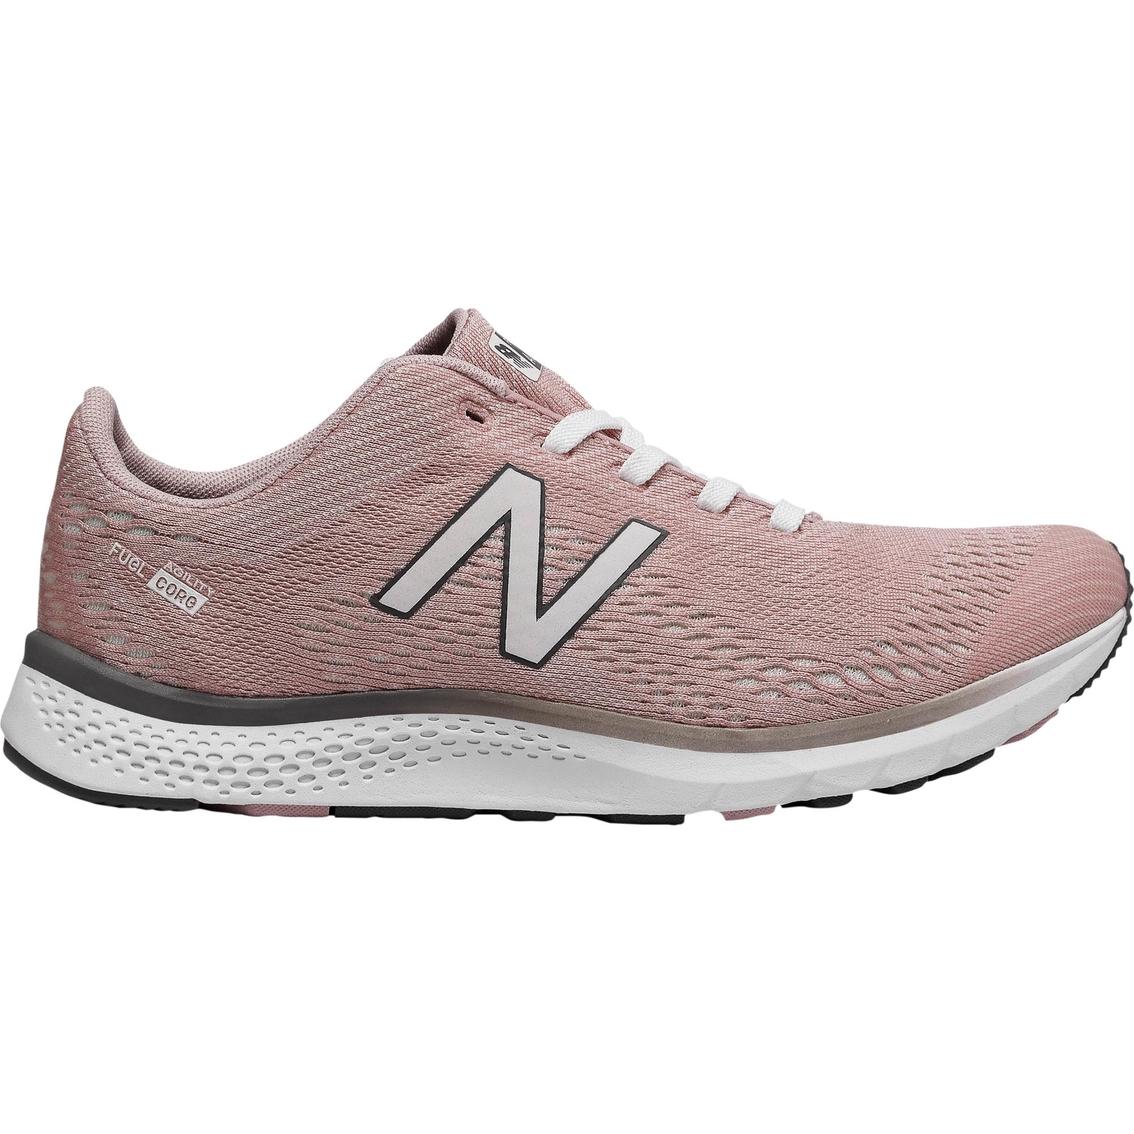 577e8a980 New Balance Women s Training Shoes Wxaglfr2